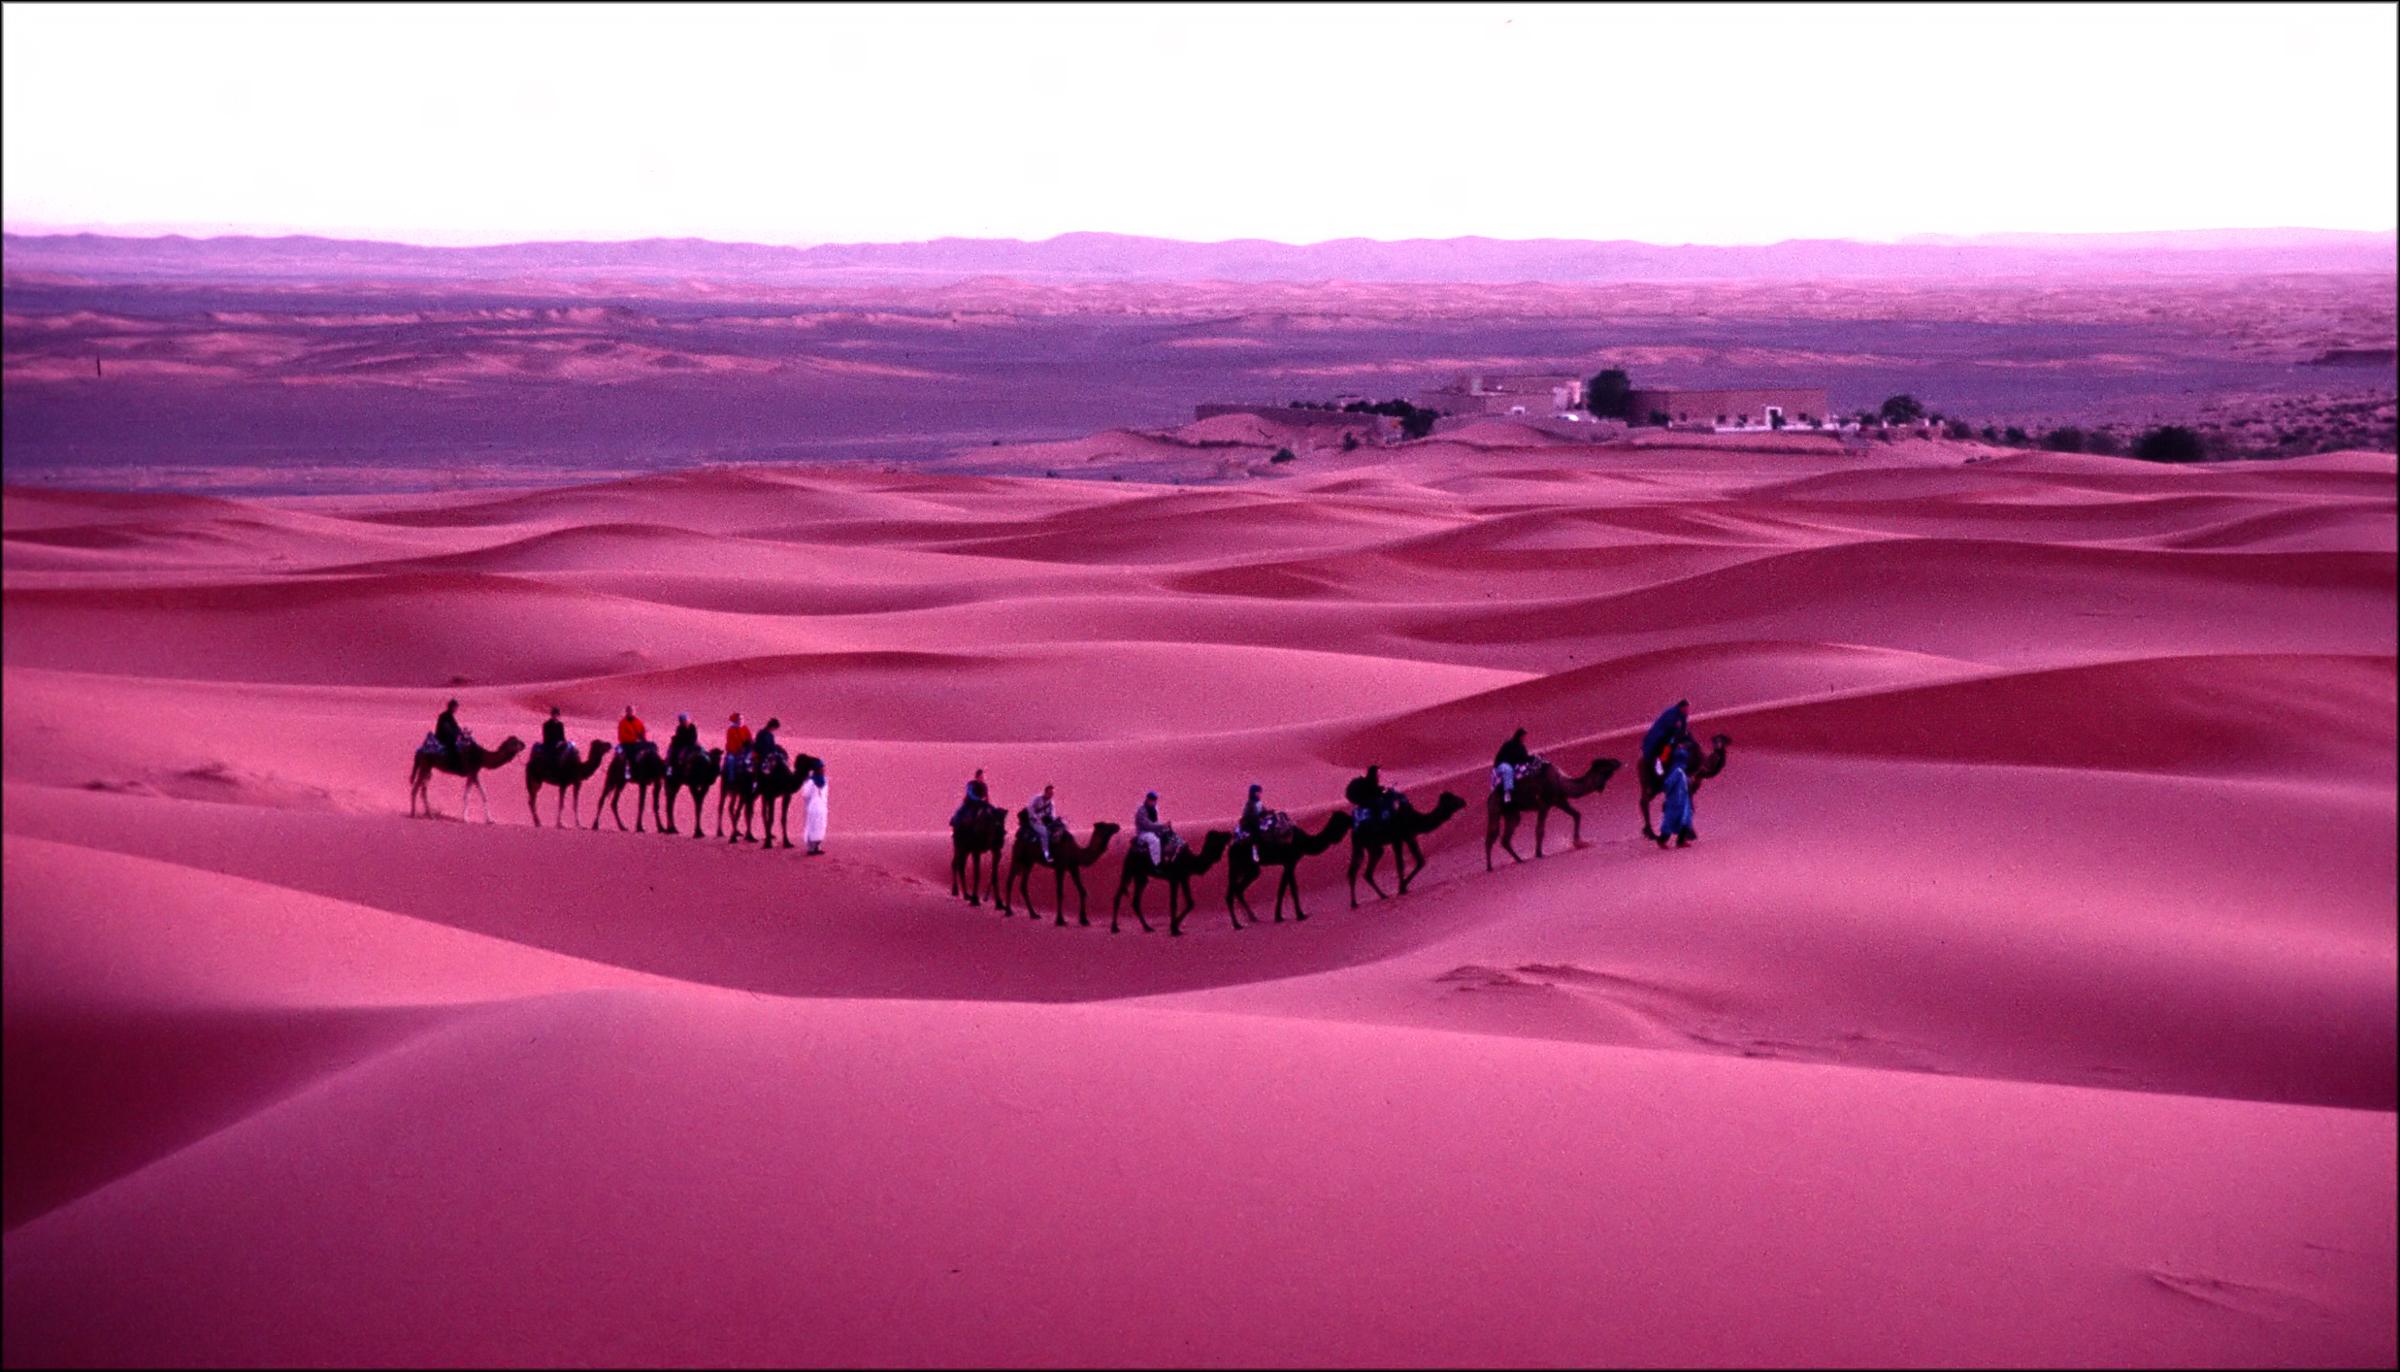 sahara desert morroco-01.jpg